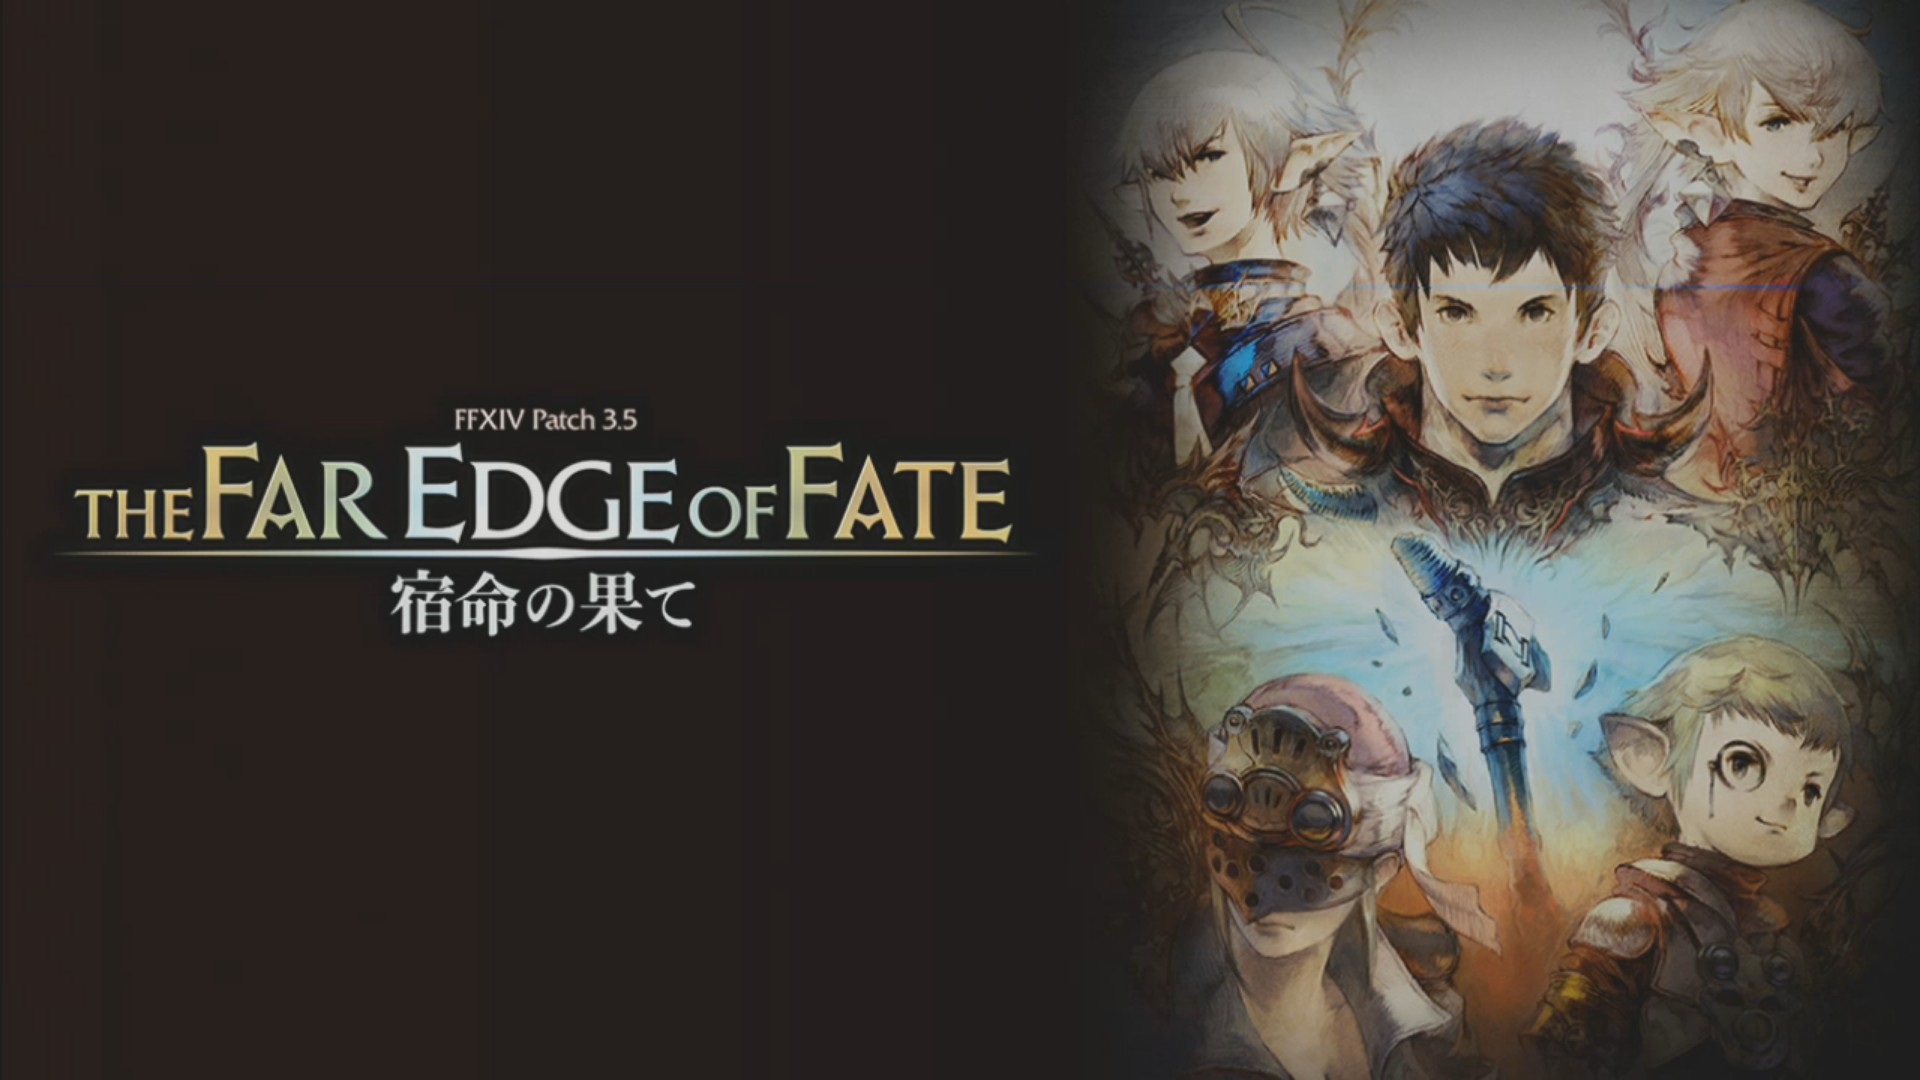 The Far Edge of Fate final fantasy xiv